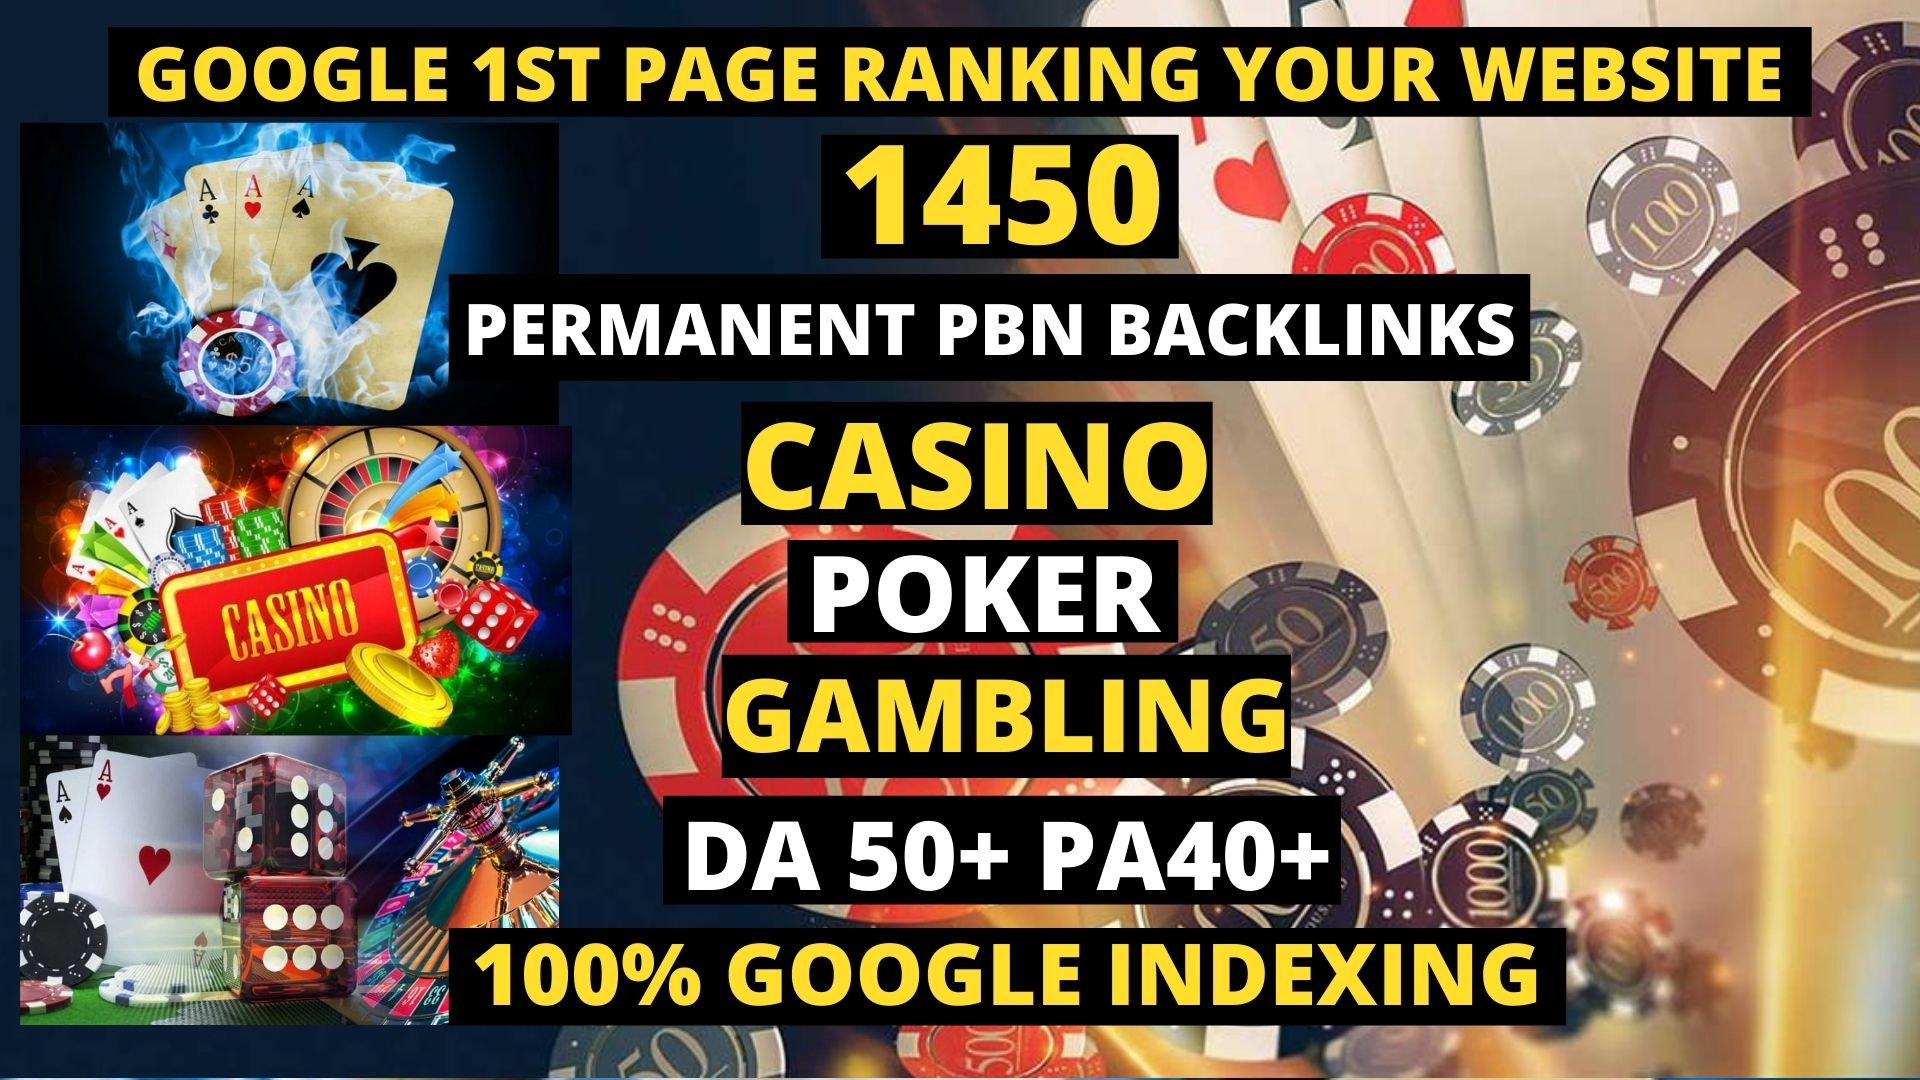 Get Unique 1450 Casino/Gambling/Poker/Judi Dofollow Backlinks Sites DA 50+ PA 40+ 500+ Words Article